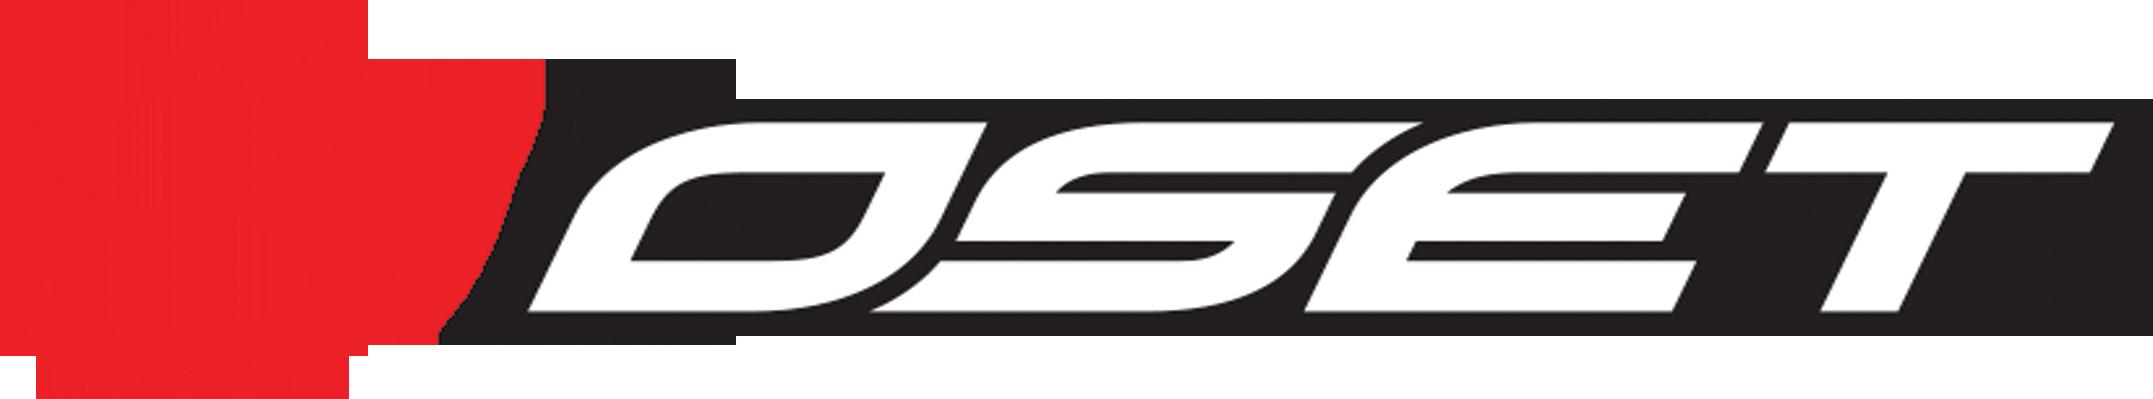 logo-letterhead.png